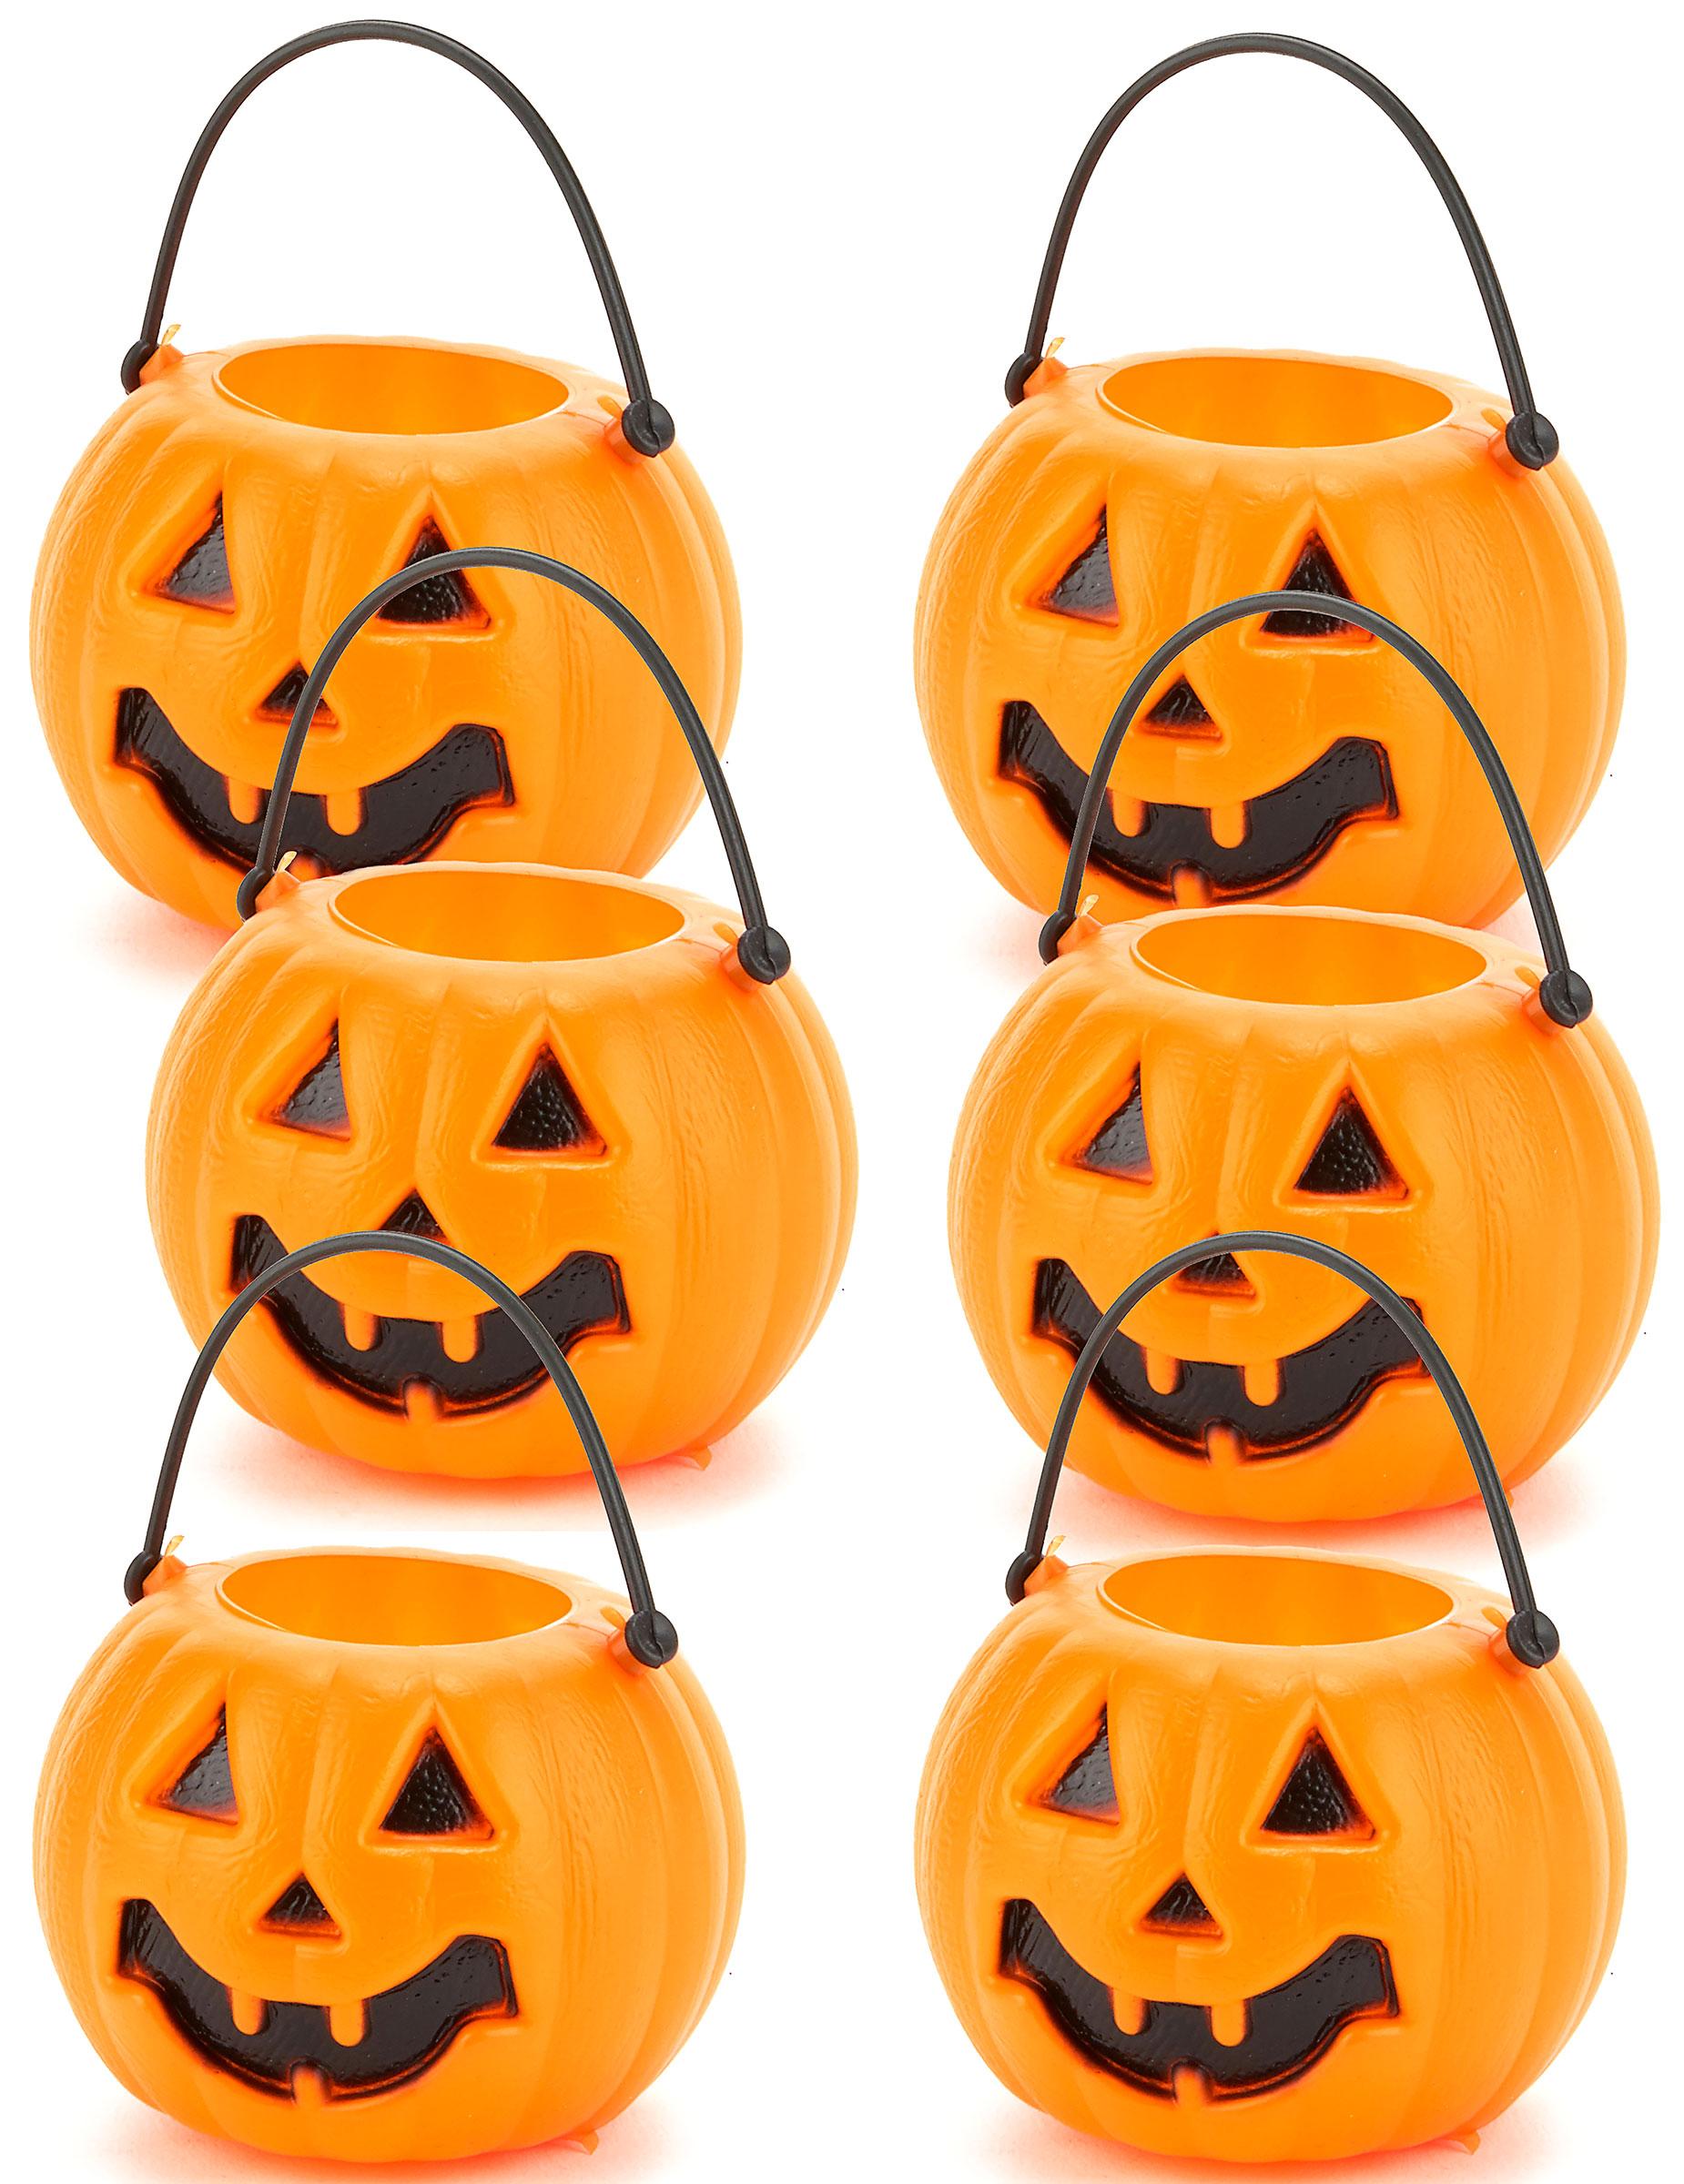 Lot 6 seaux citrouilles halloween deguise toi achat de decoration animation - Deguisetoi fr halloween ...